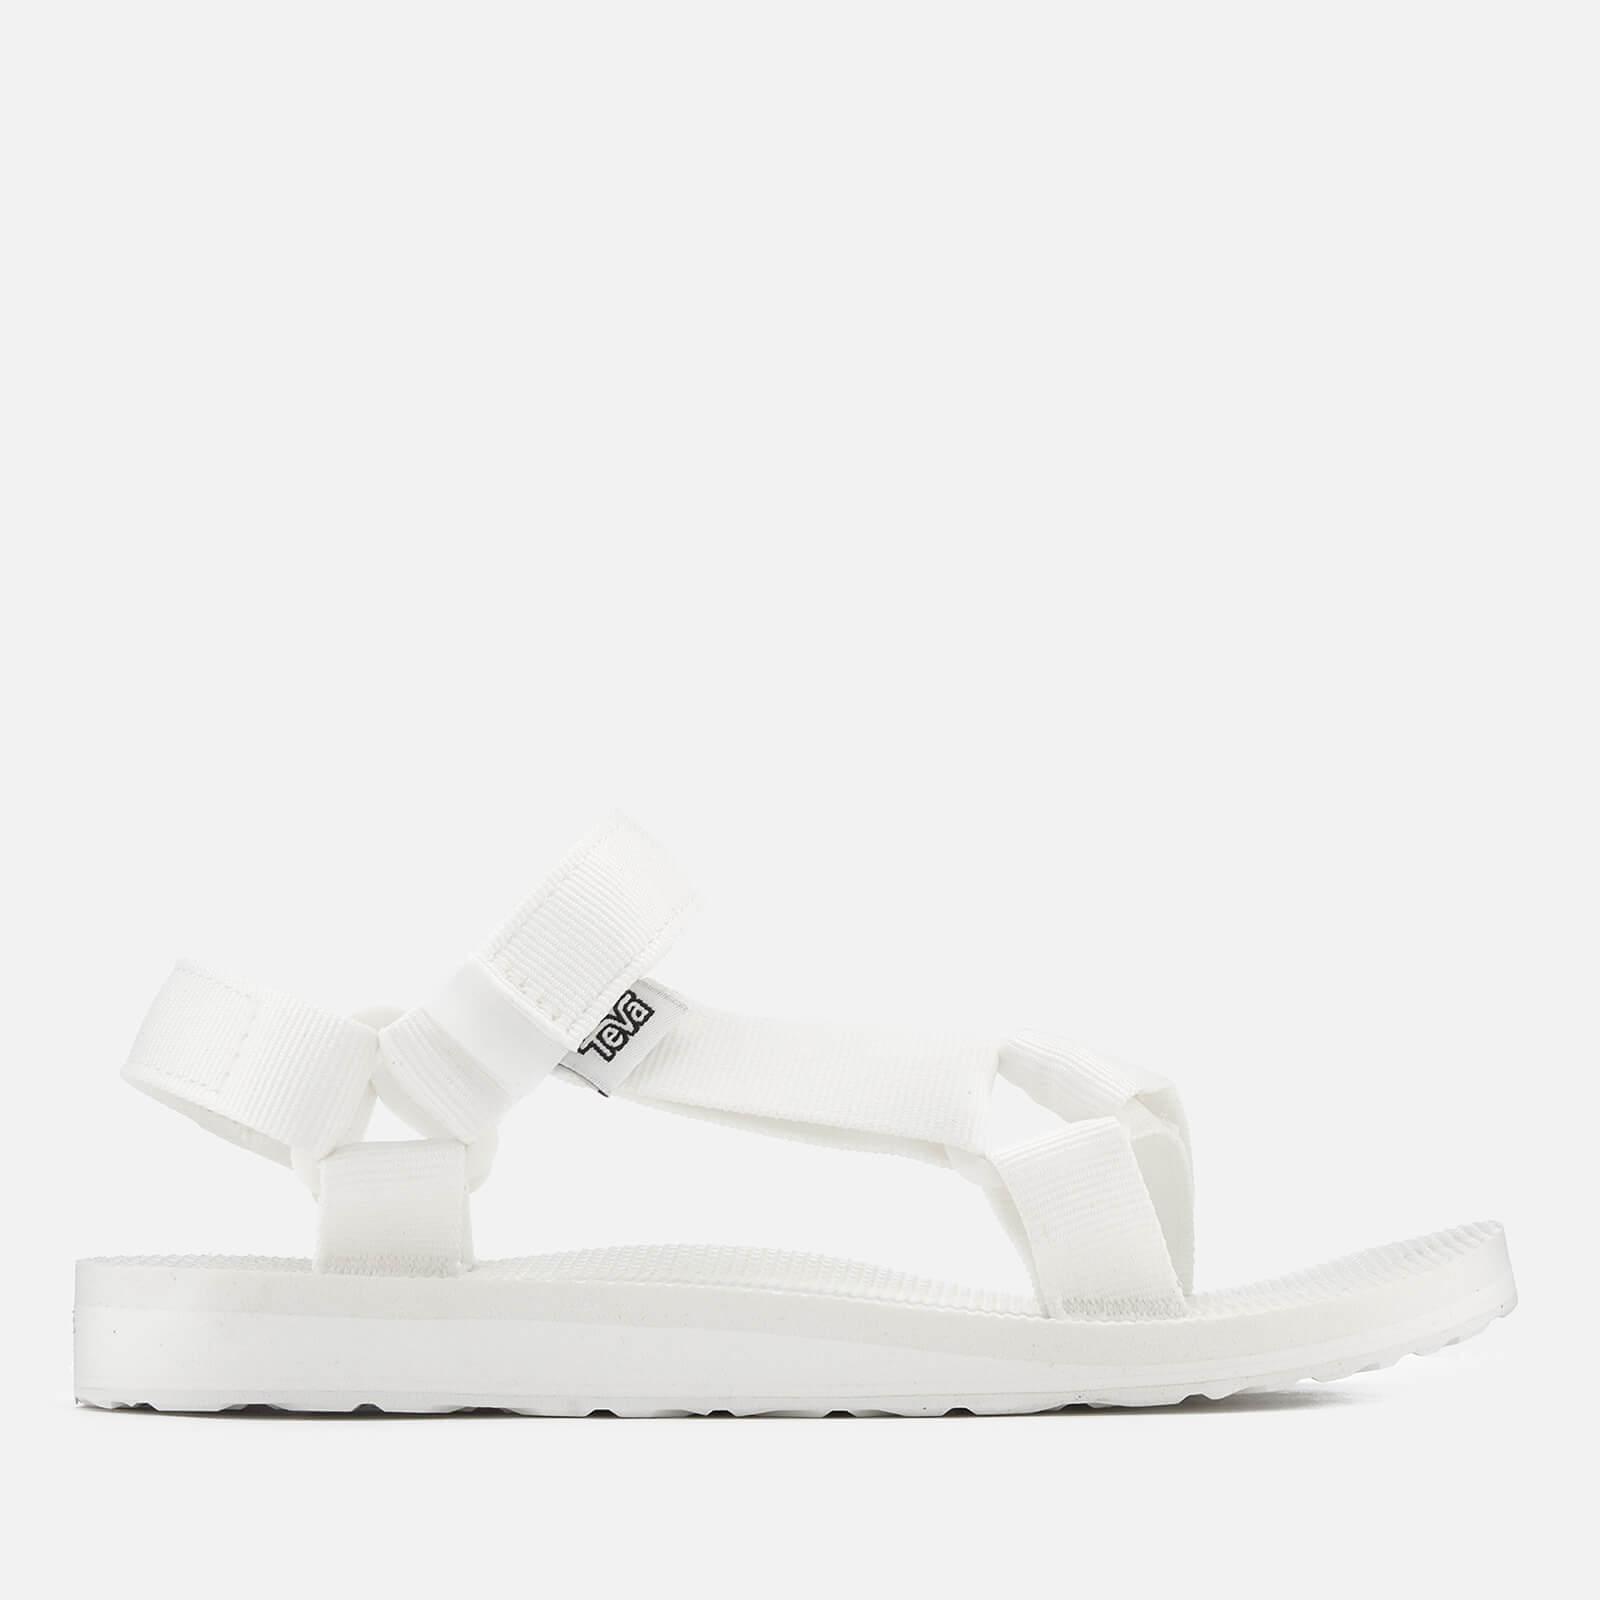 Teva Women's Original Universal Sport Sandals - Bright White - UK 6